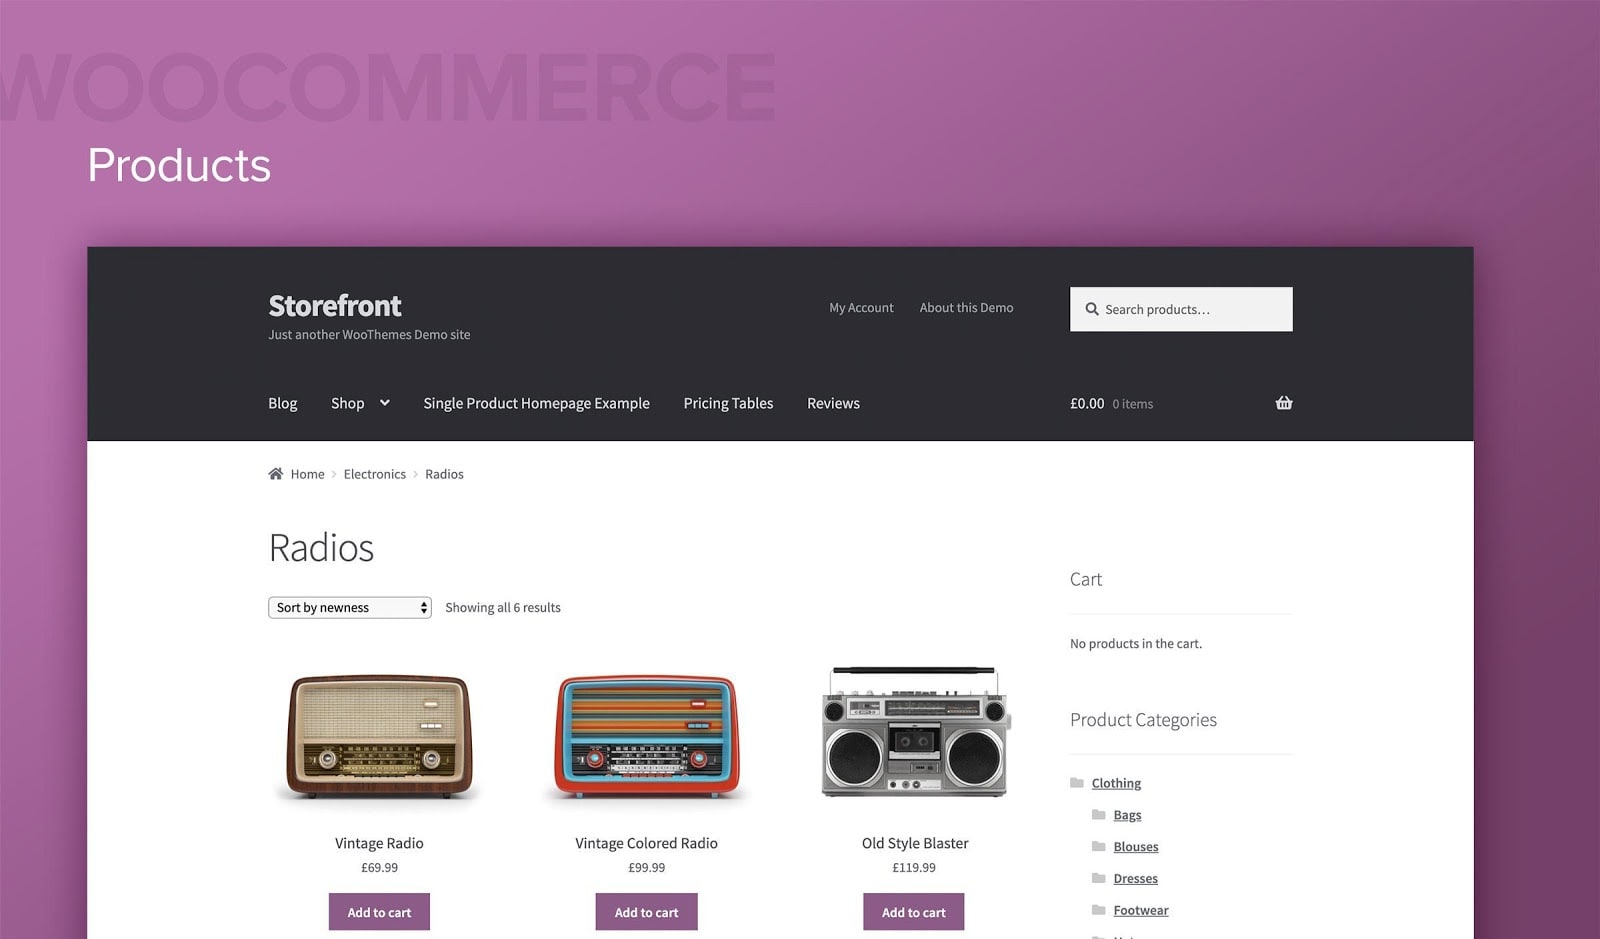 Migliori Plugin Wordpress per Ecommerce